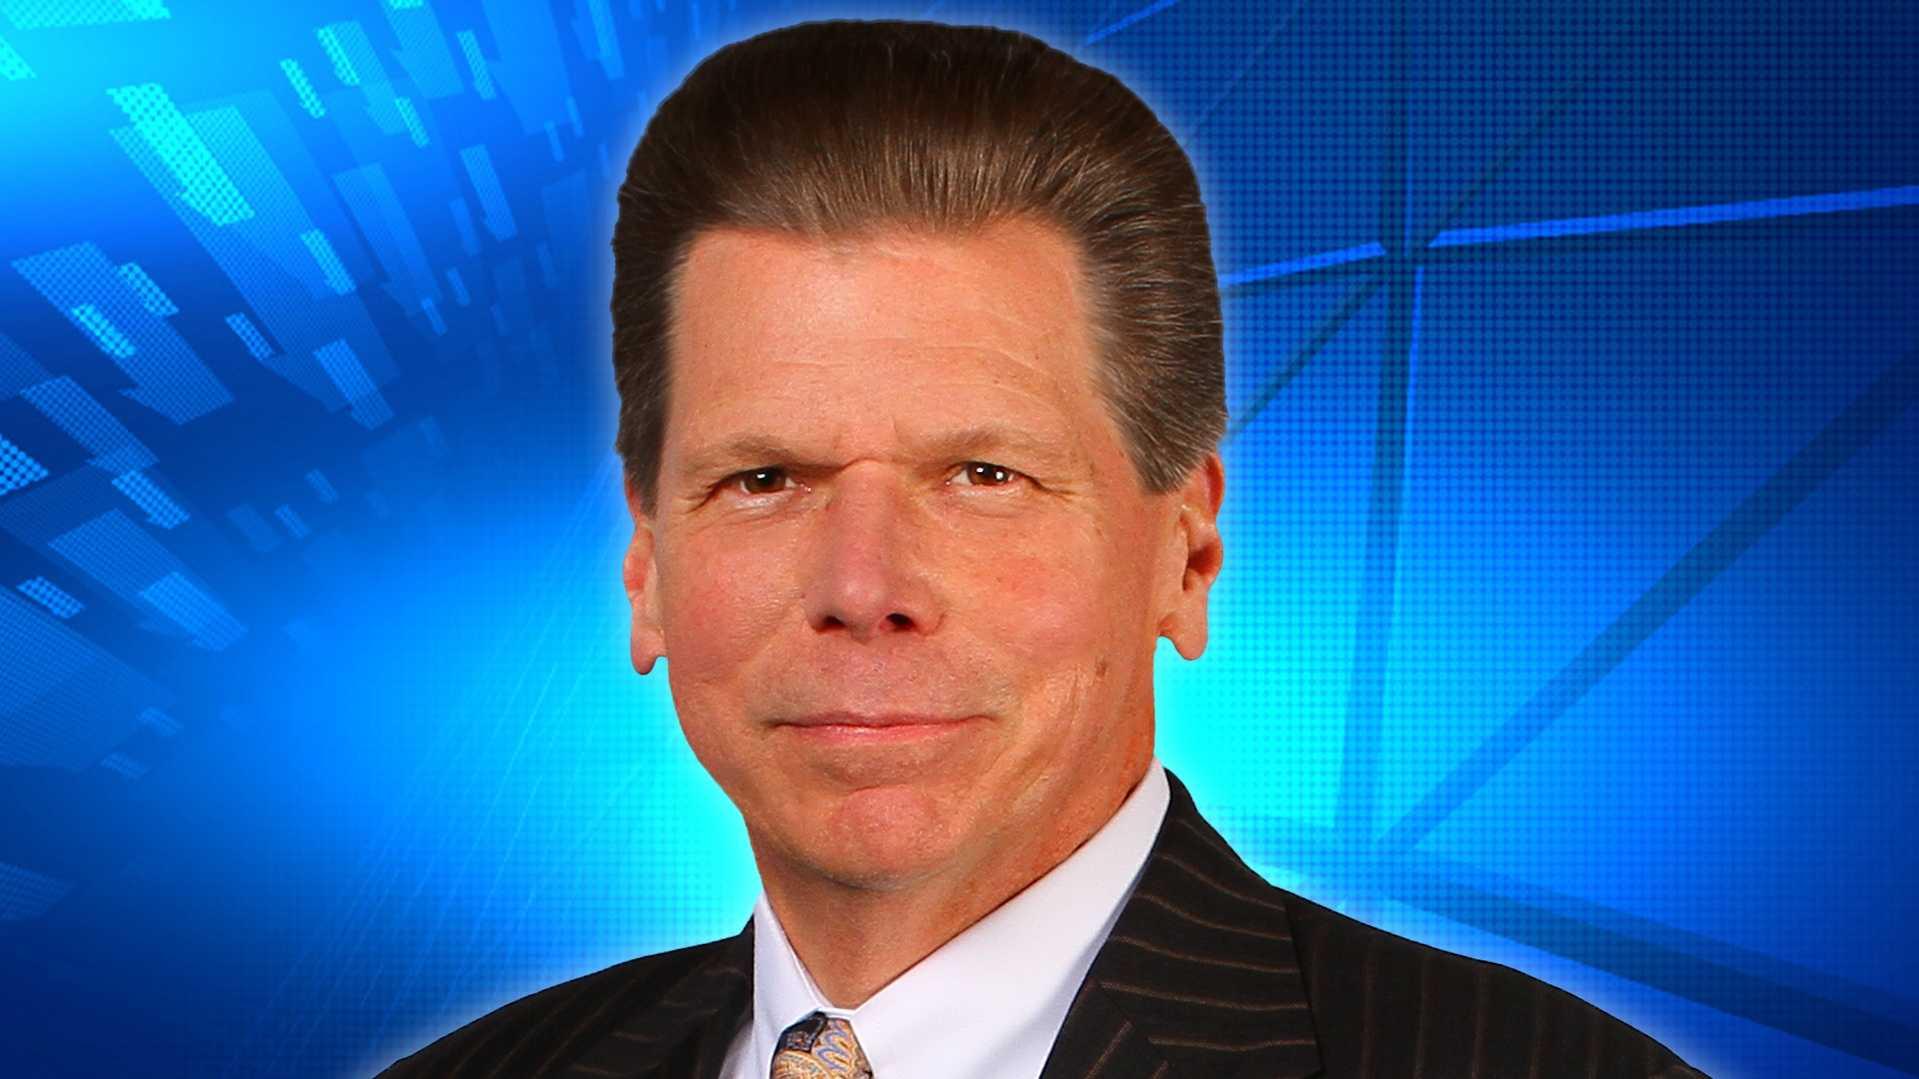 Joseph W. Heston